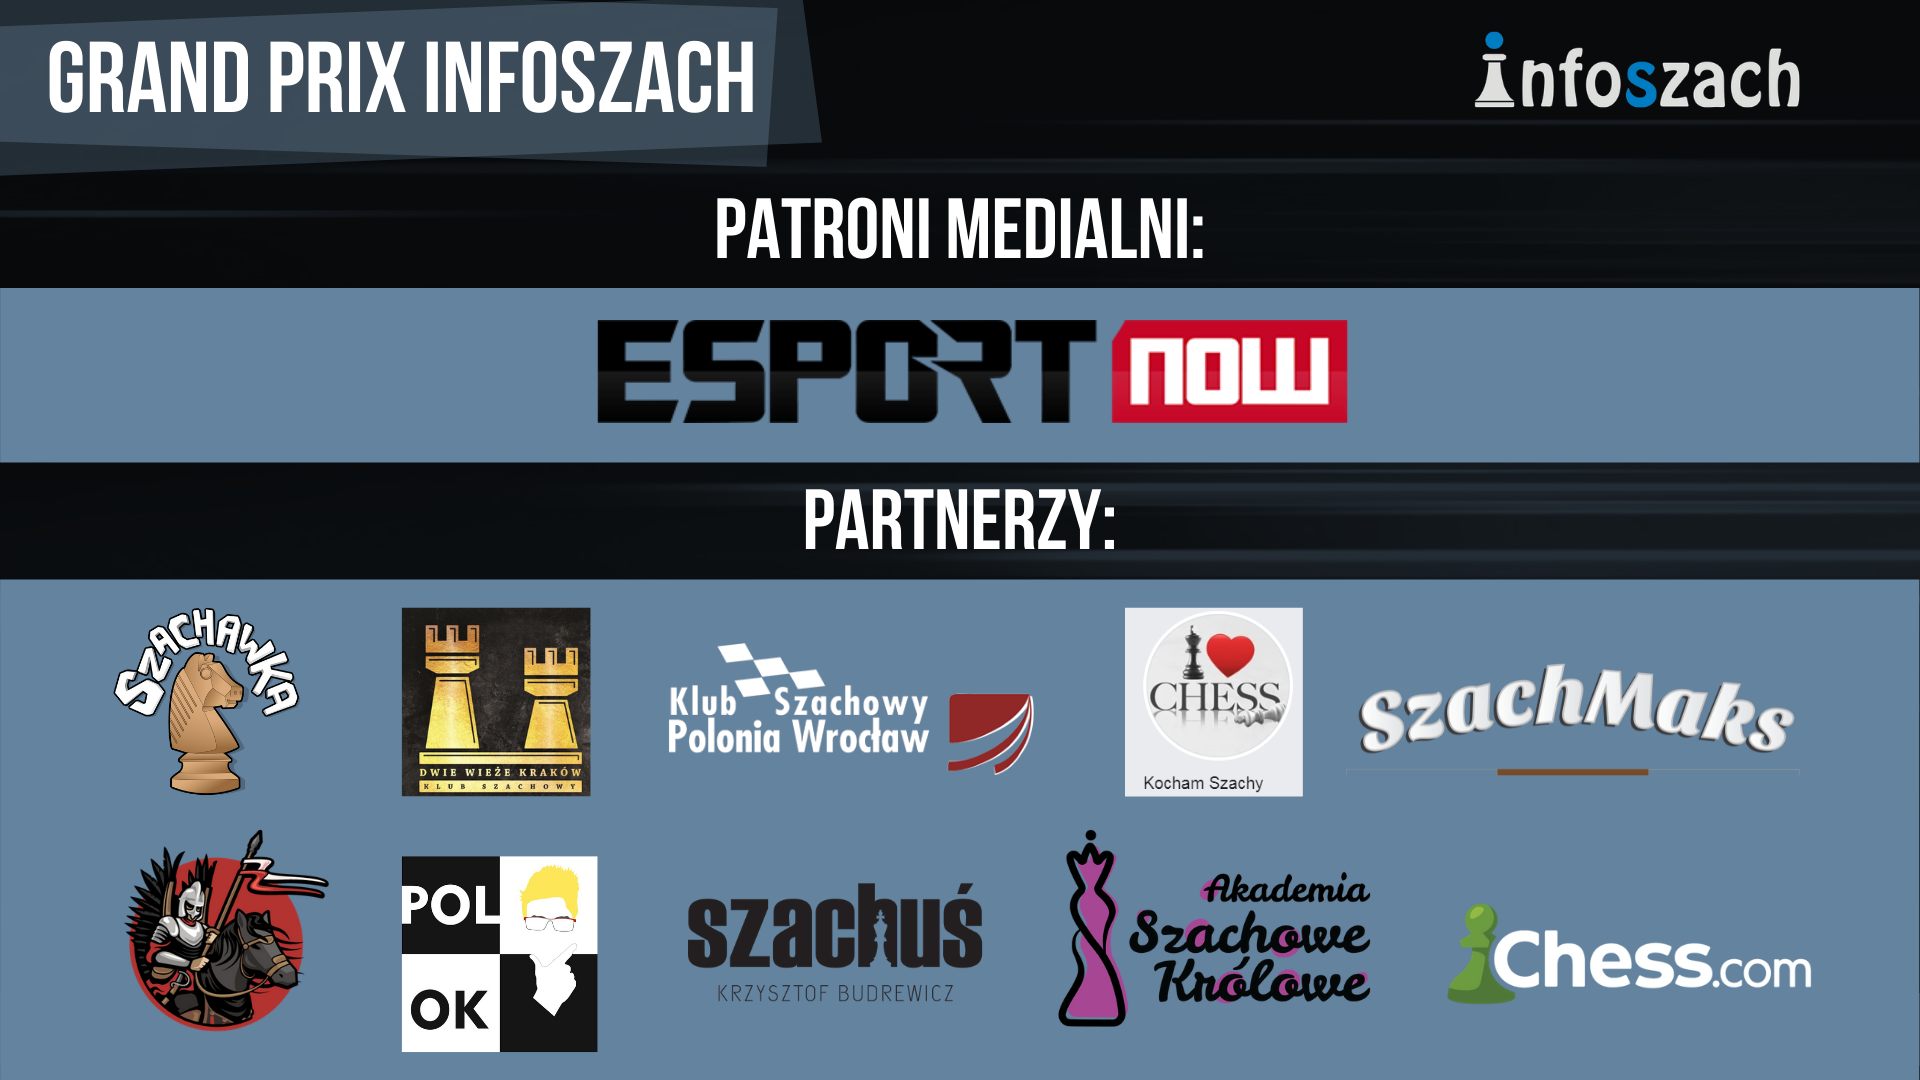 Grand Prix Infoszach (2)